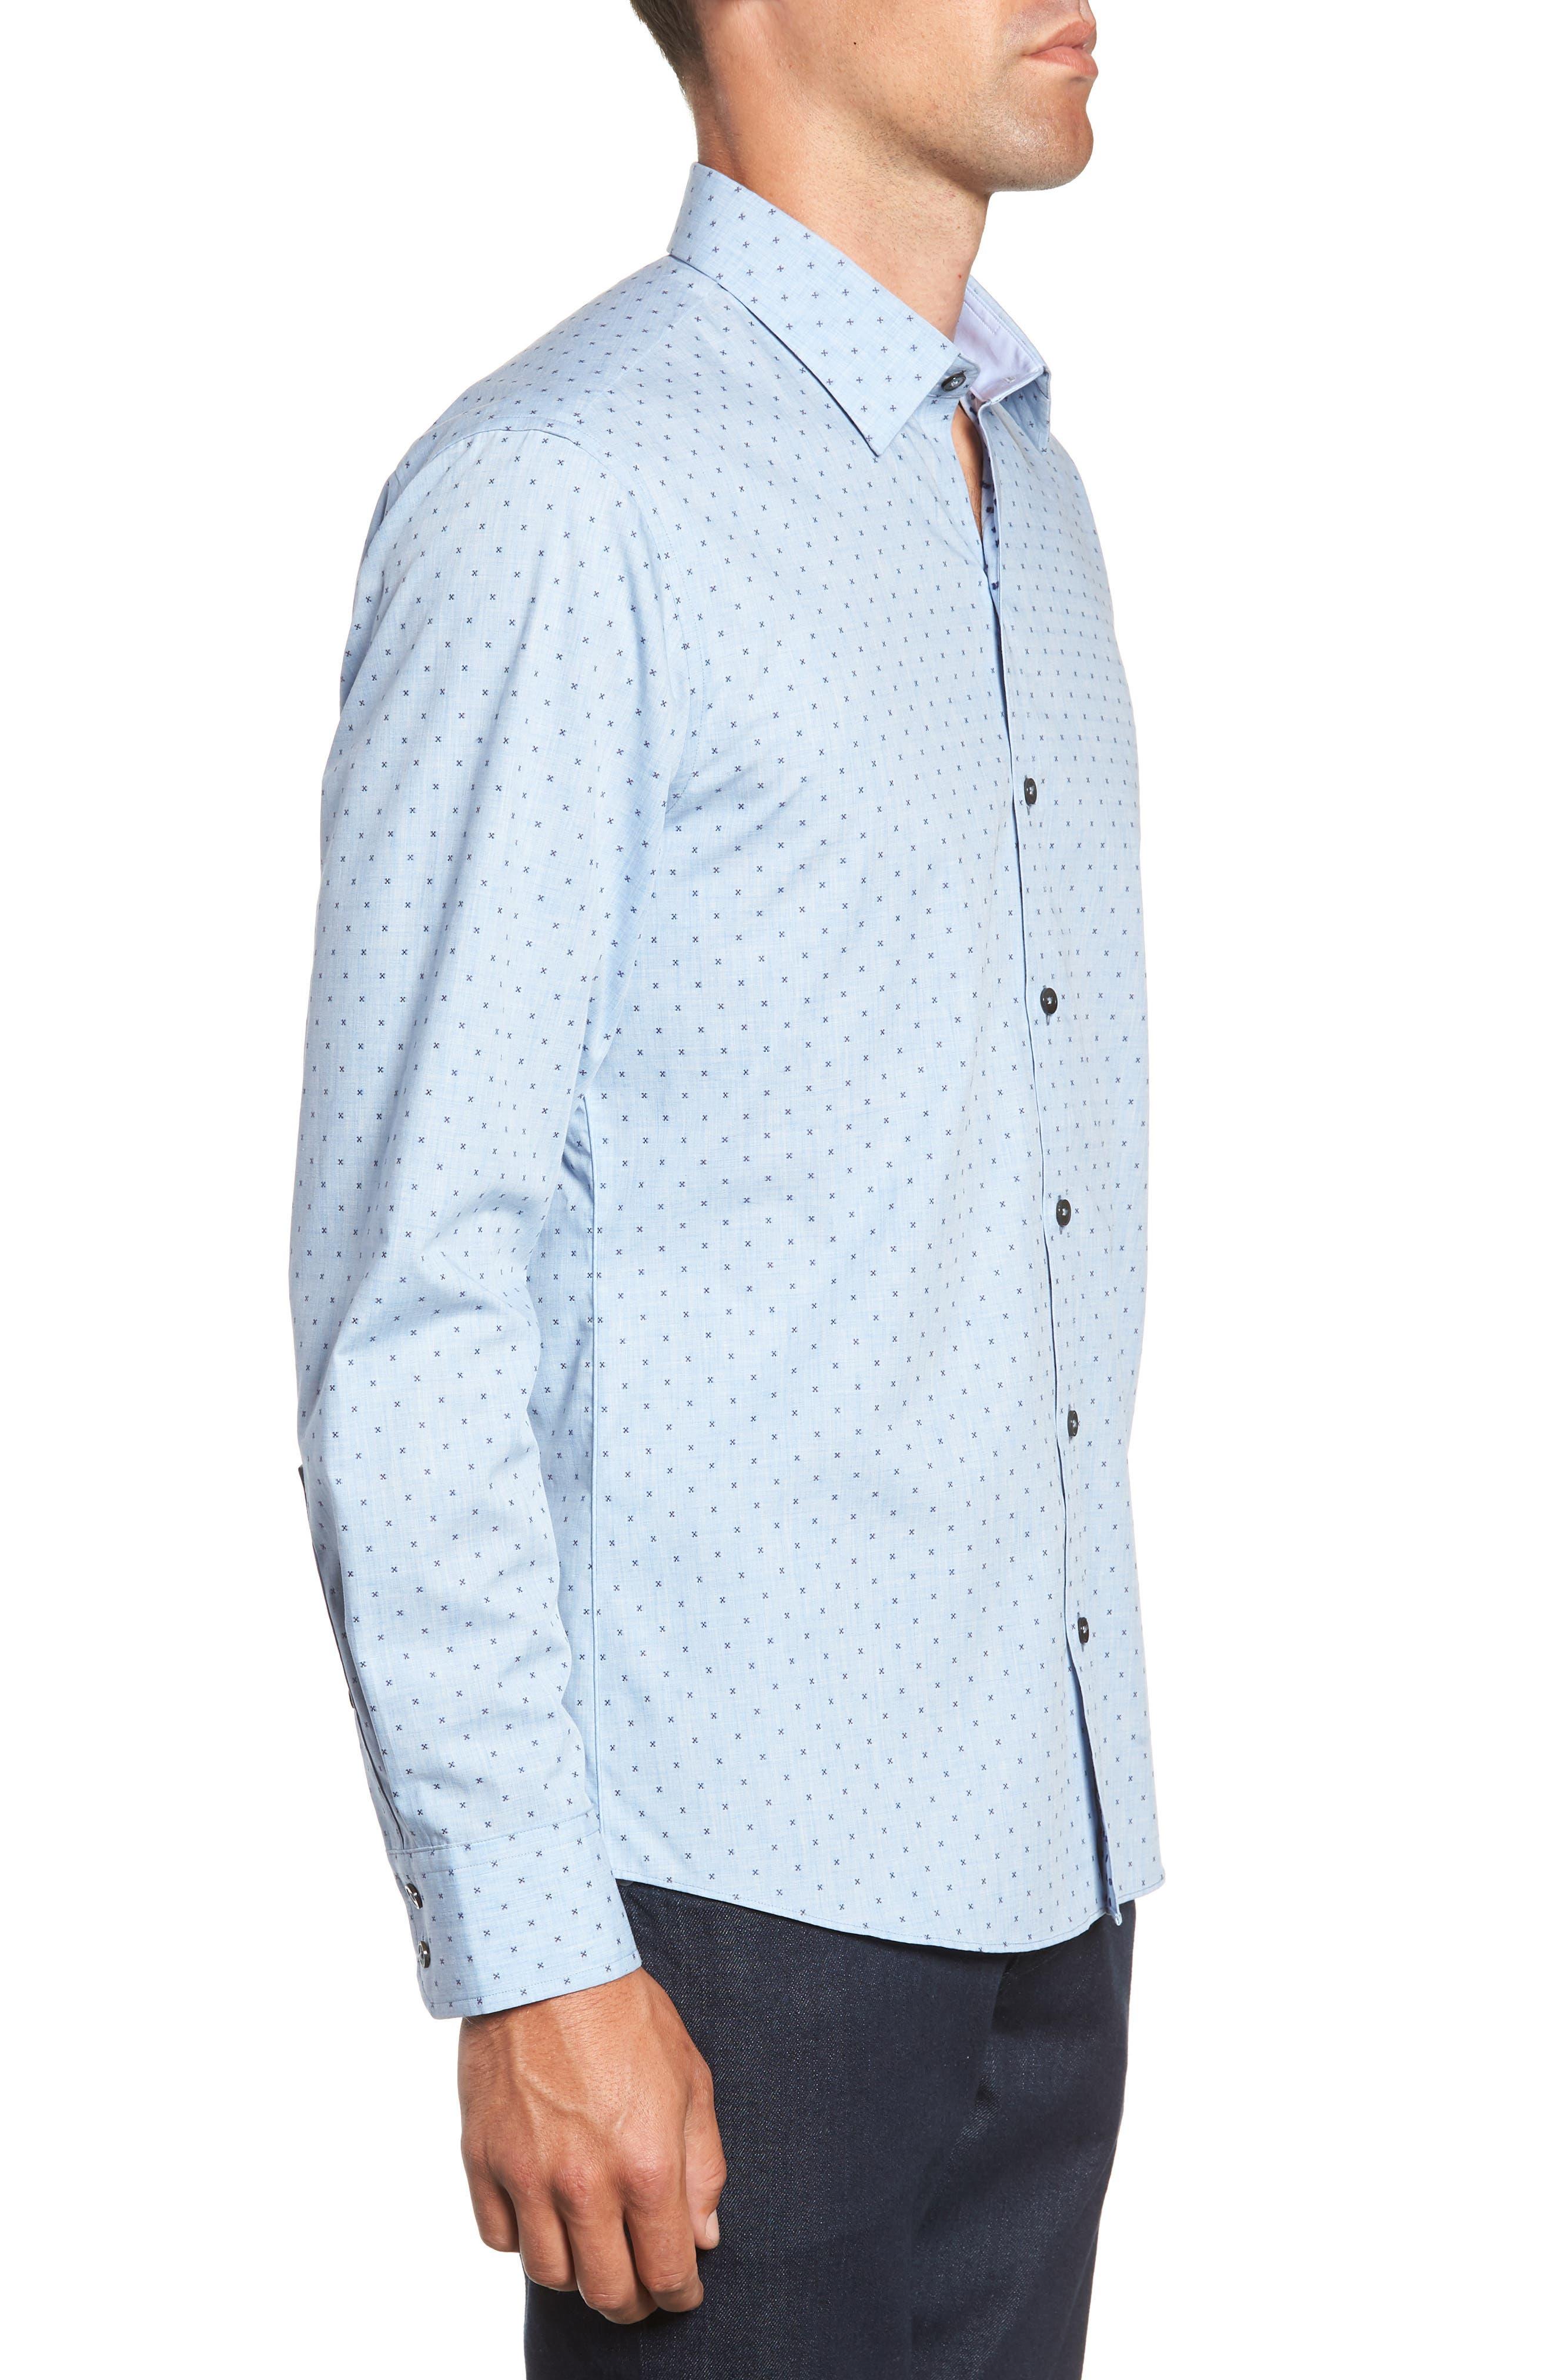 ZACHARY PRELL,                             Zhang Regular Fit Sport Shirt,                             Alternate thumbnail 4, color,                             LIGHT BLUE